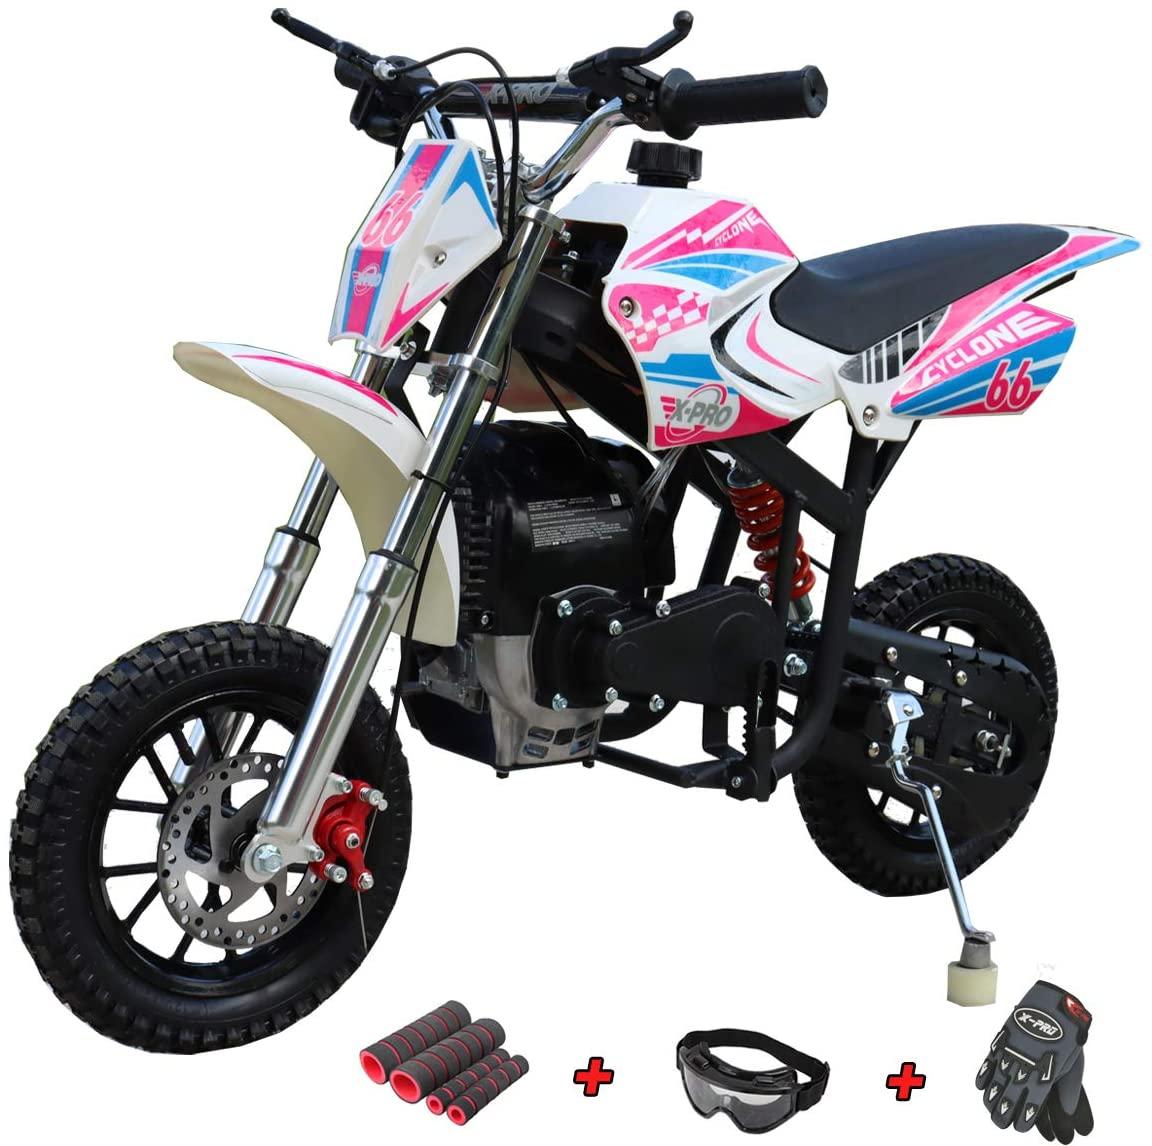 X-PRO Cyclone 40cc Kids Dirt Bike Mini Pit Bike Dirt Bikes Motorcycle Gas Power Bike Off Road (Pink)